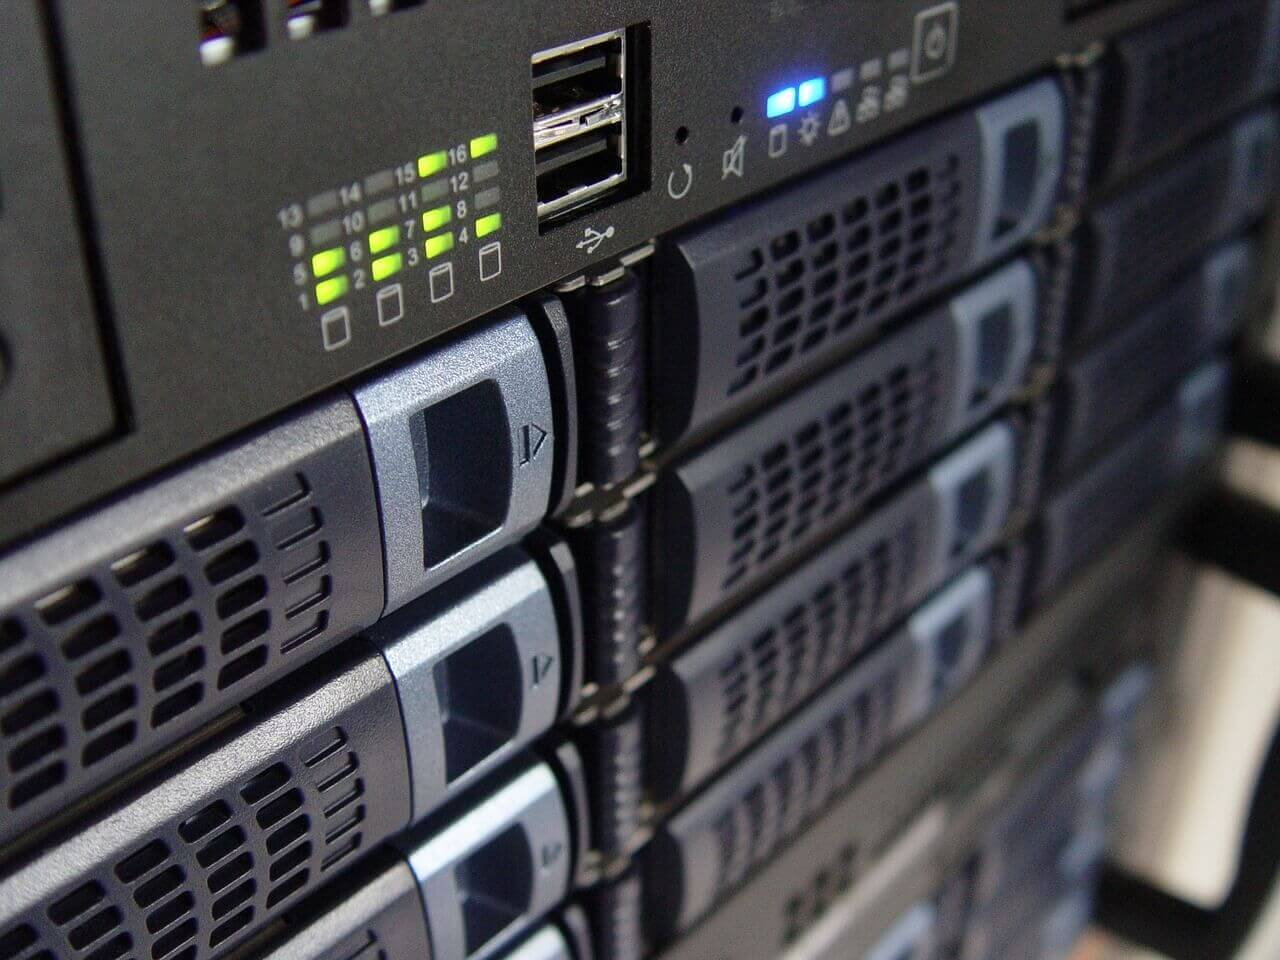 Windows Server の管理共有を含めた共有フォルダーの権限一覧を表示する方法